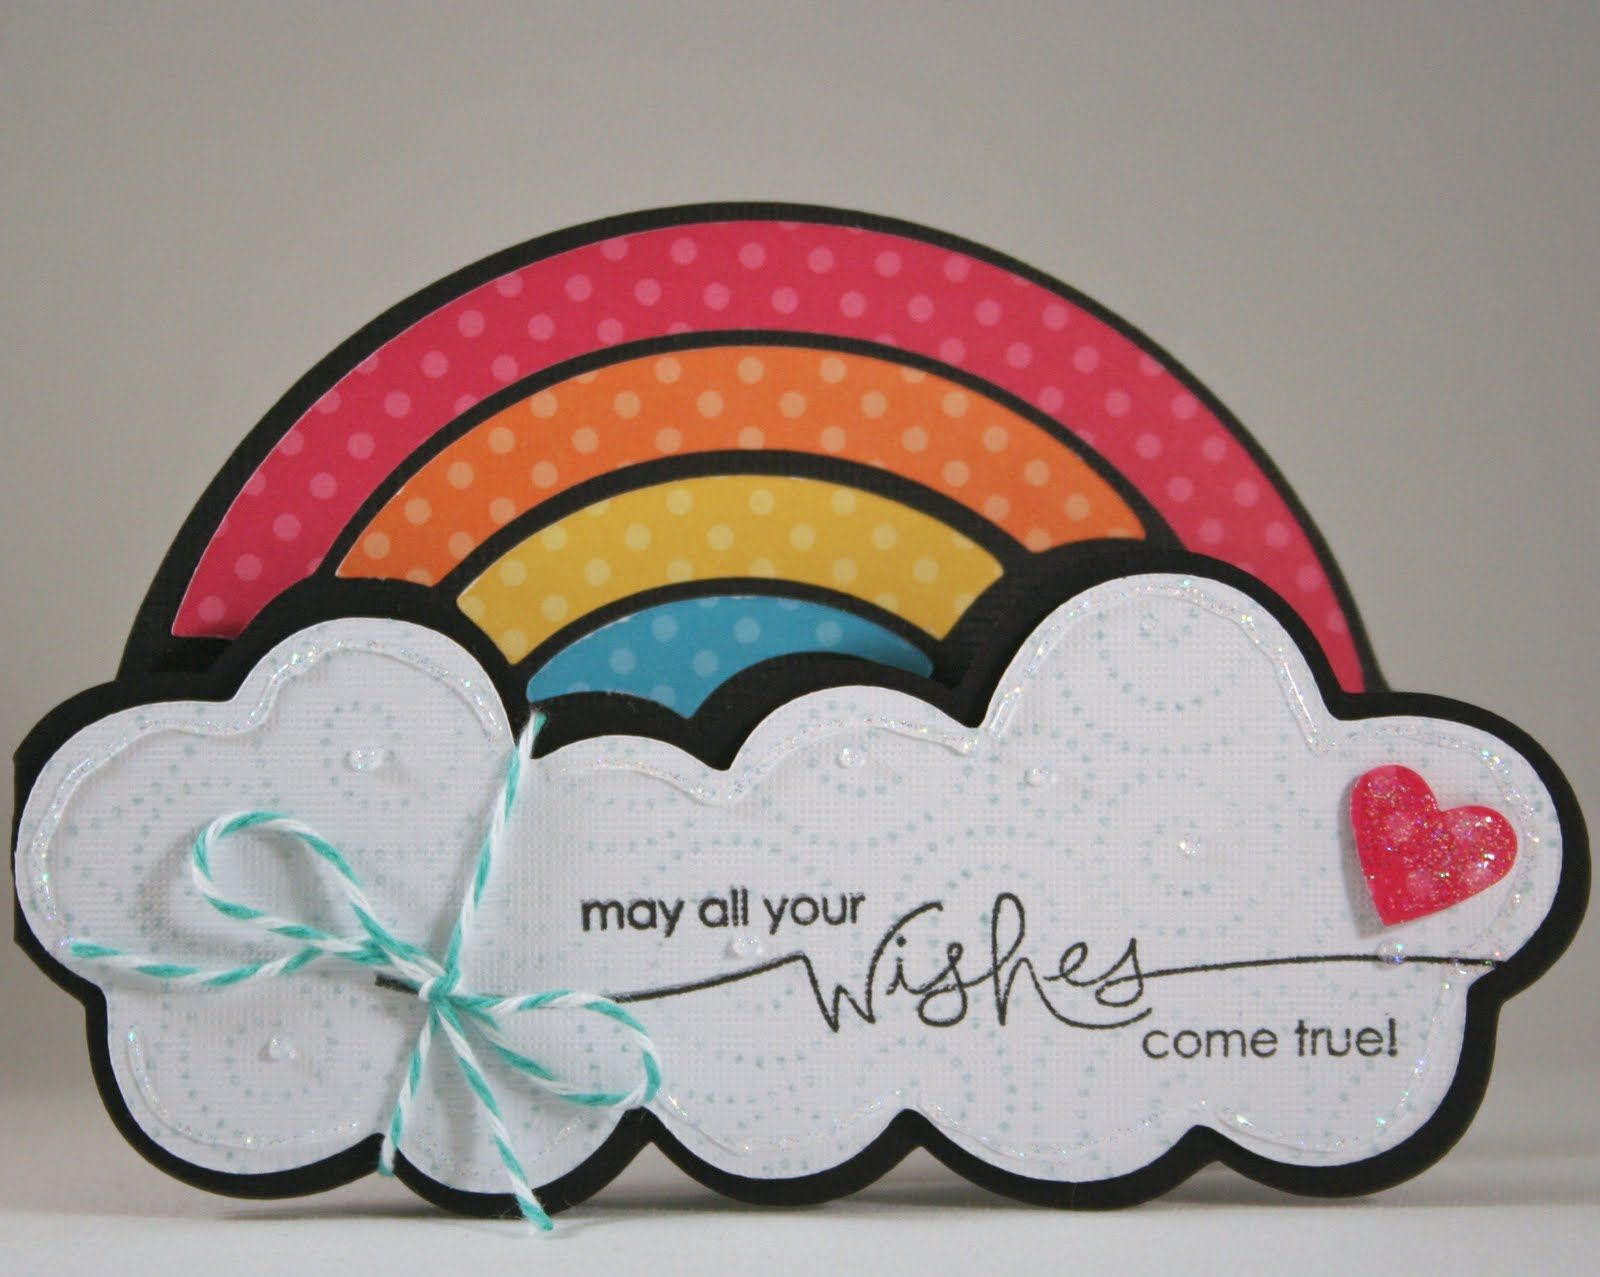 Hello kitty scrapbook ideas - Hello Kitty Greetings Cricut Cartridge Rainbow And Cloud Card